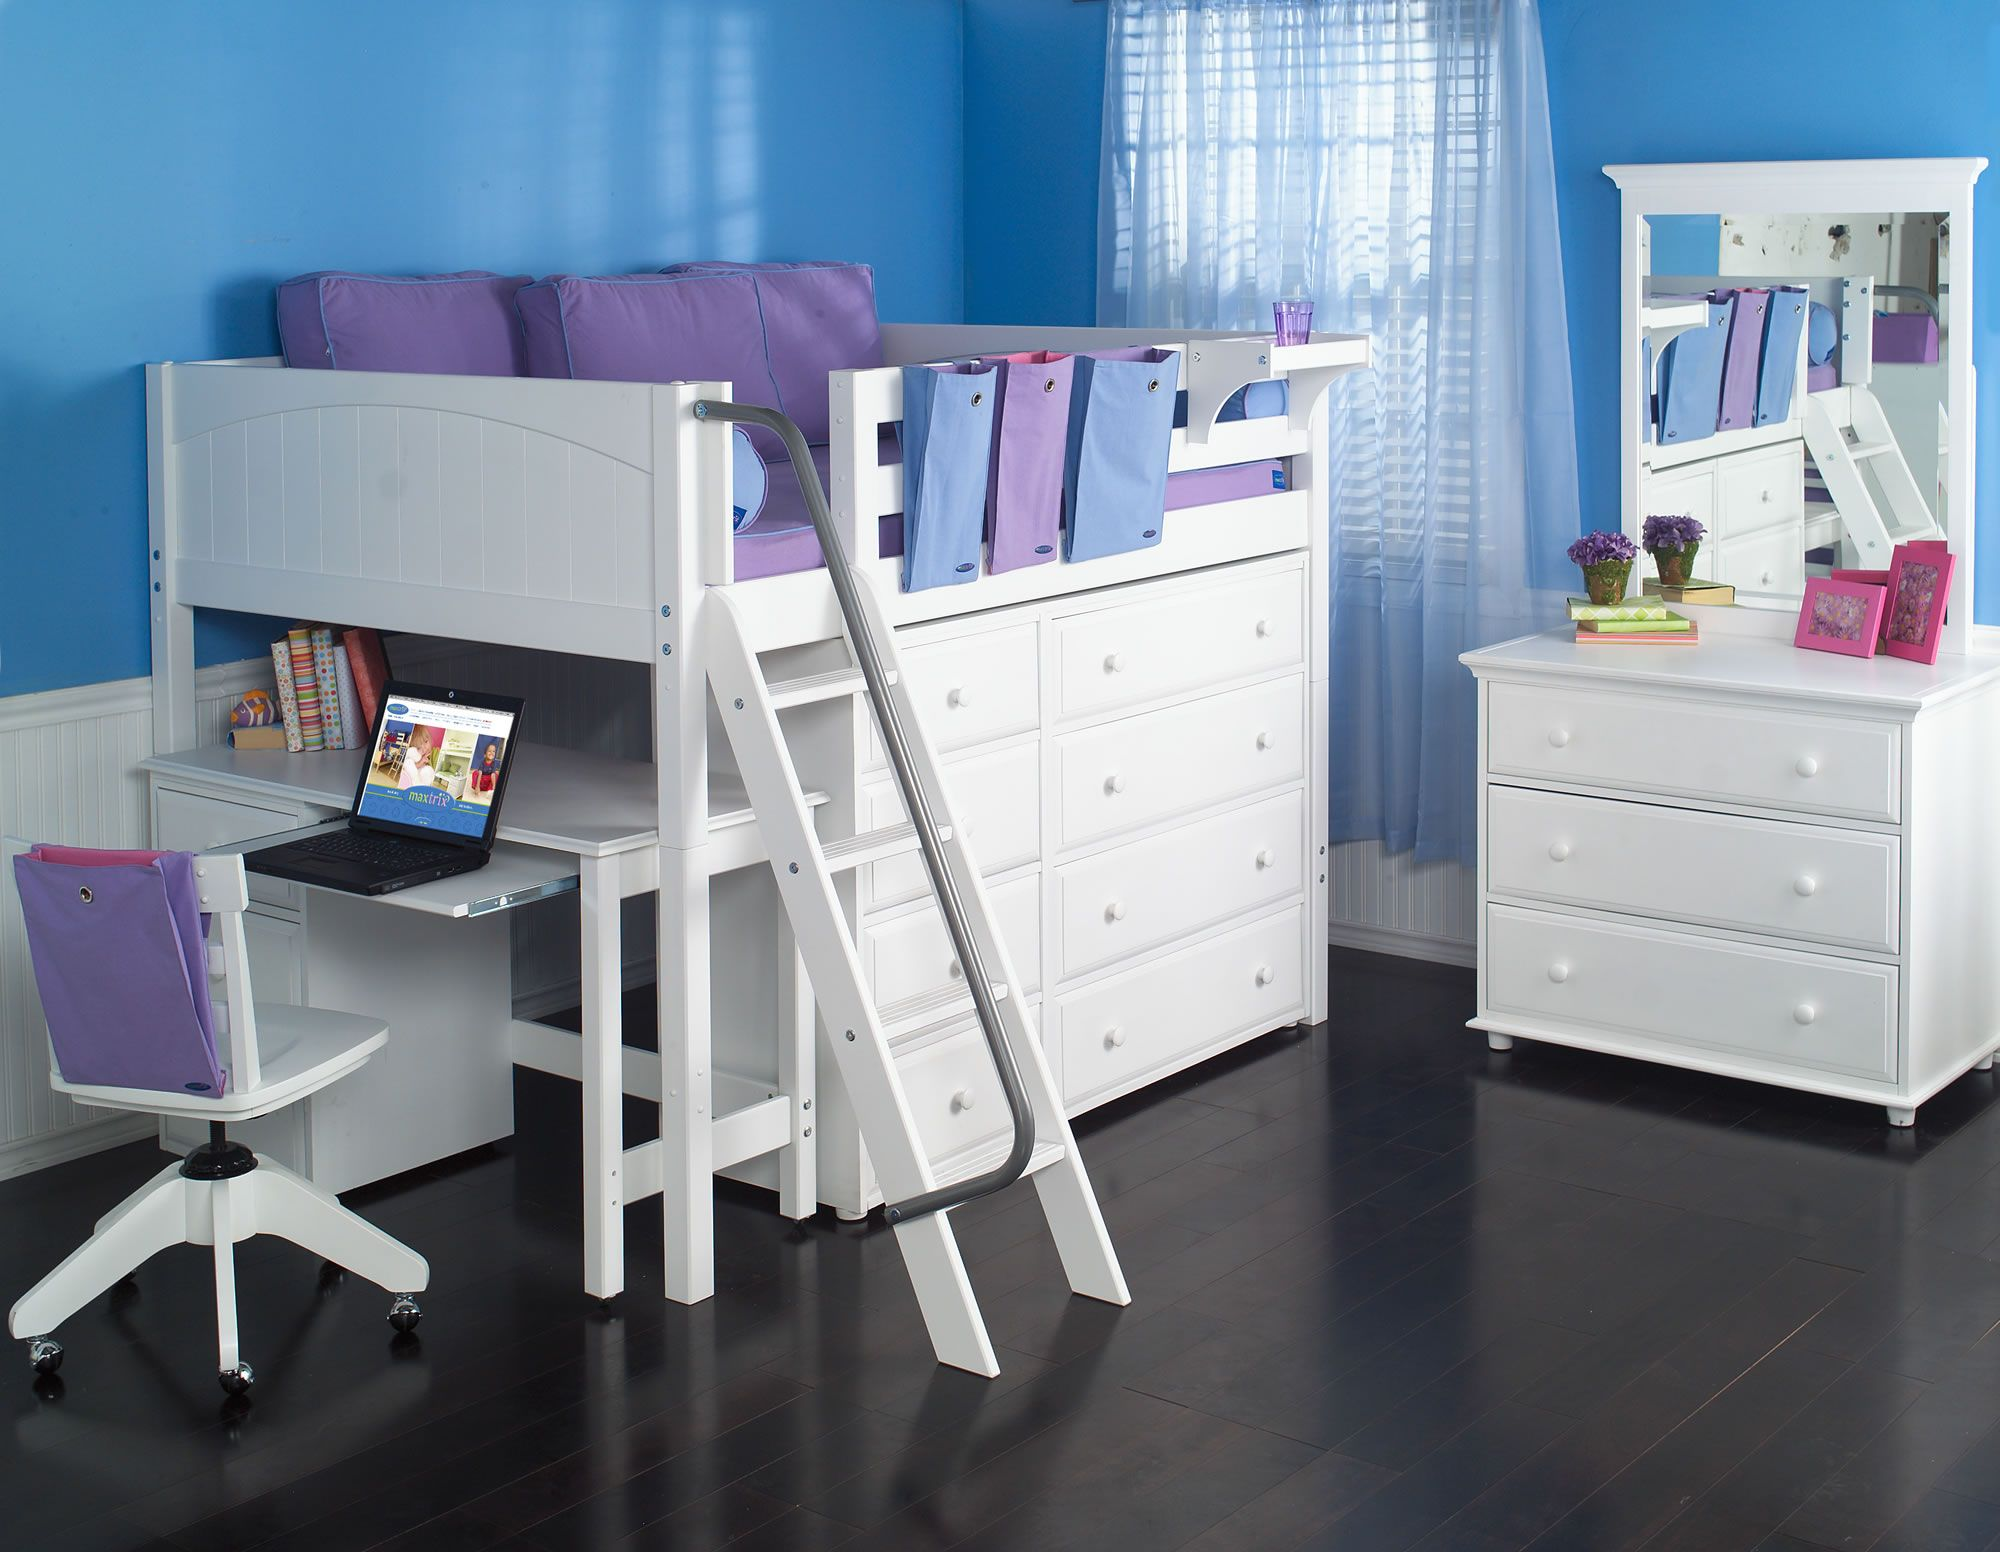 Loft bed organization ideas  kongg  pixels  Star House Childrens Furniture